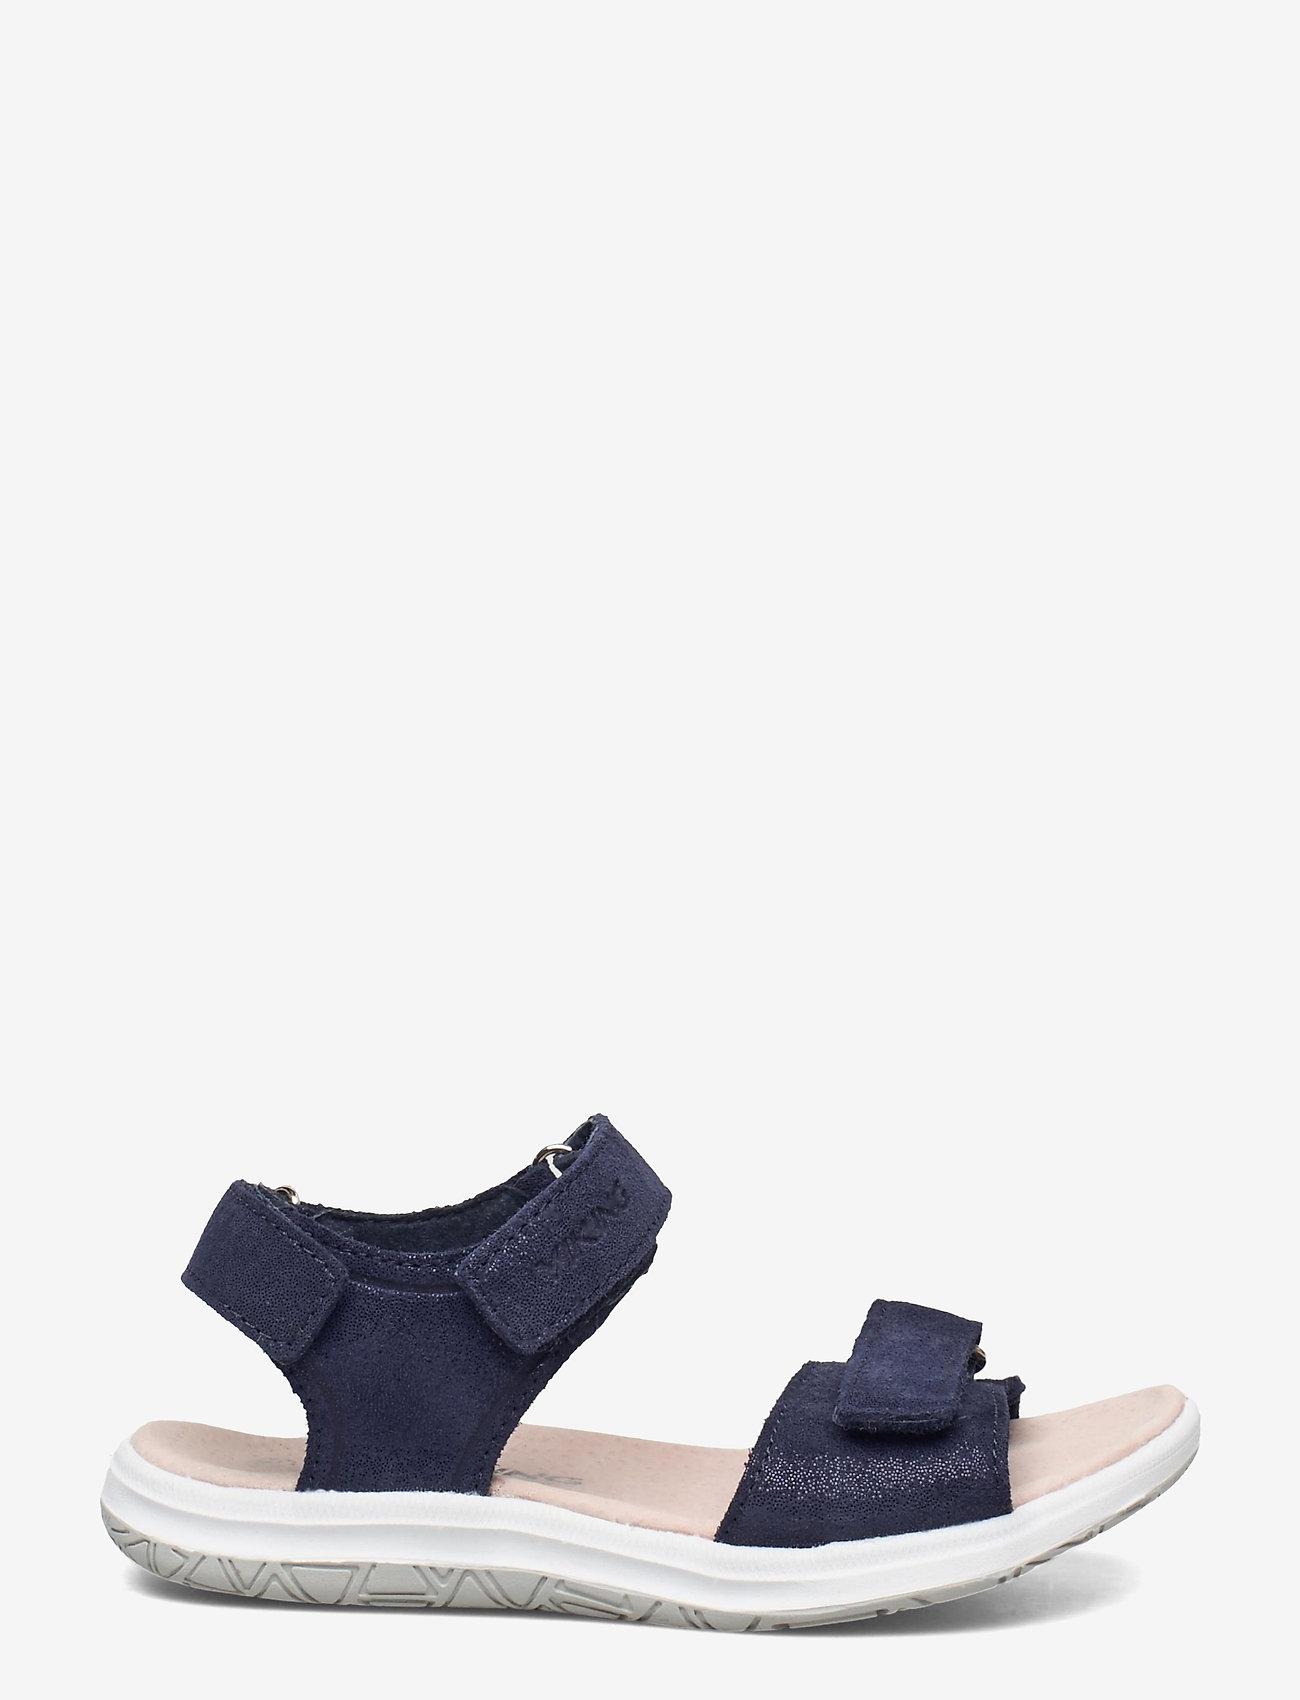 Viking - Helle Metallic - sport shoes - navy - 1